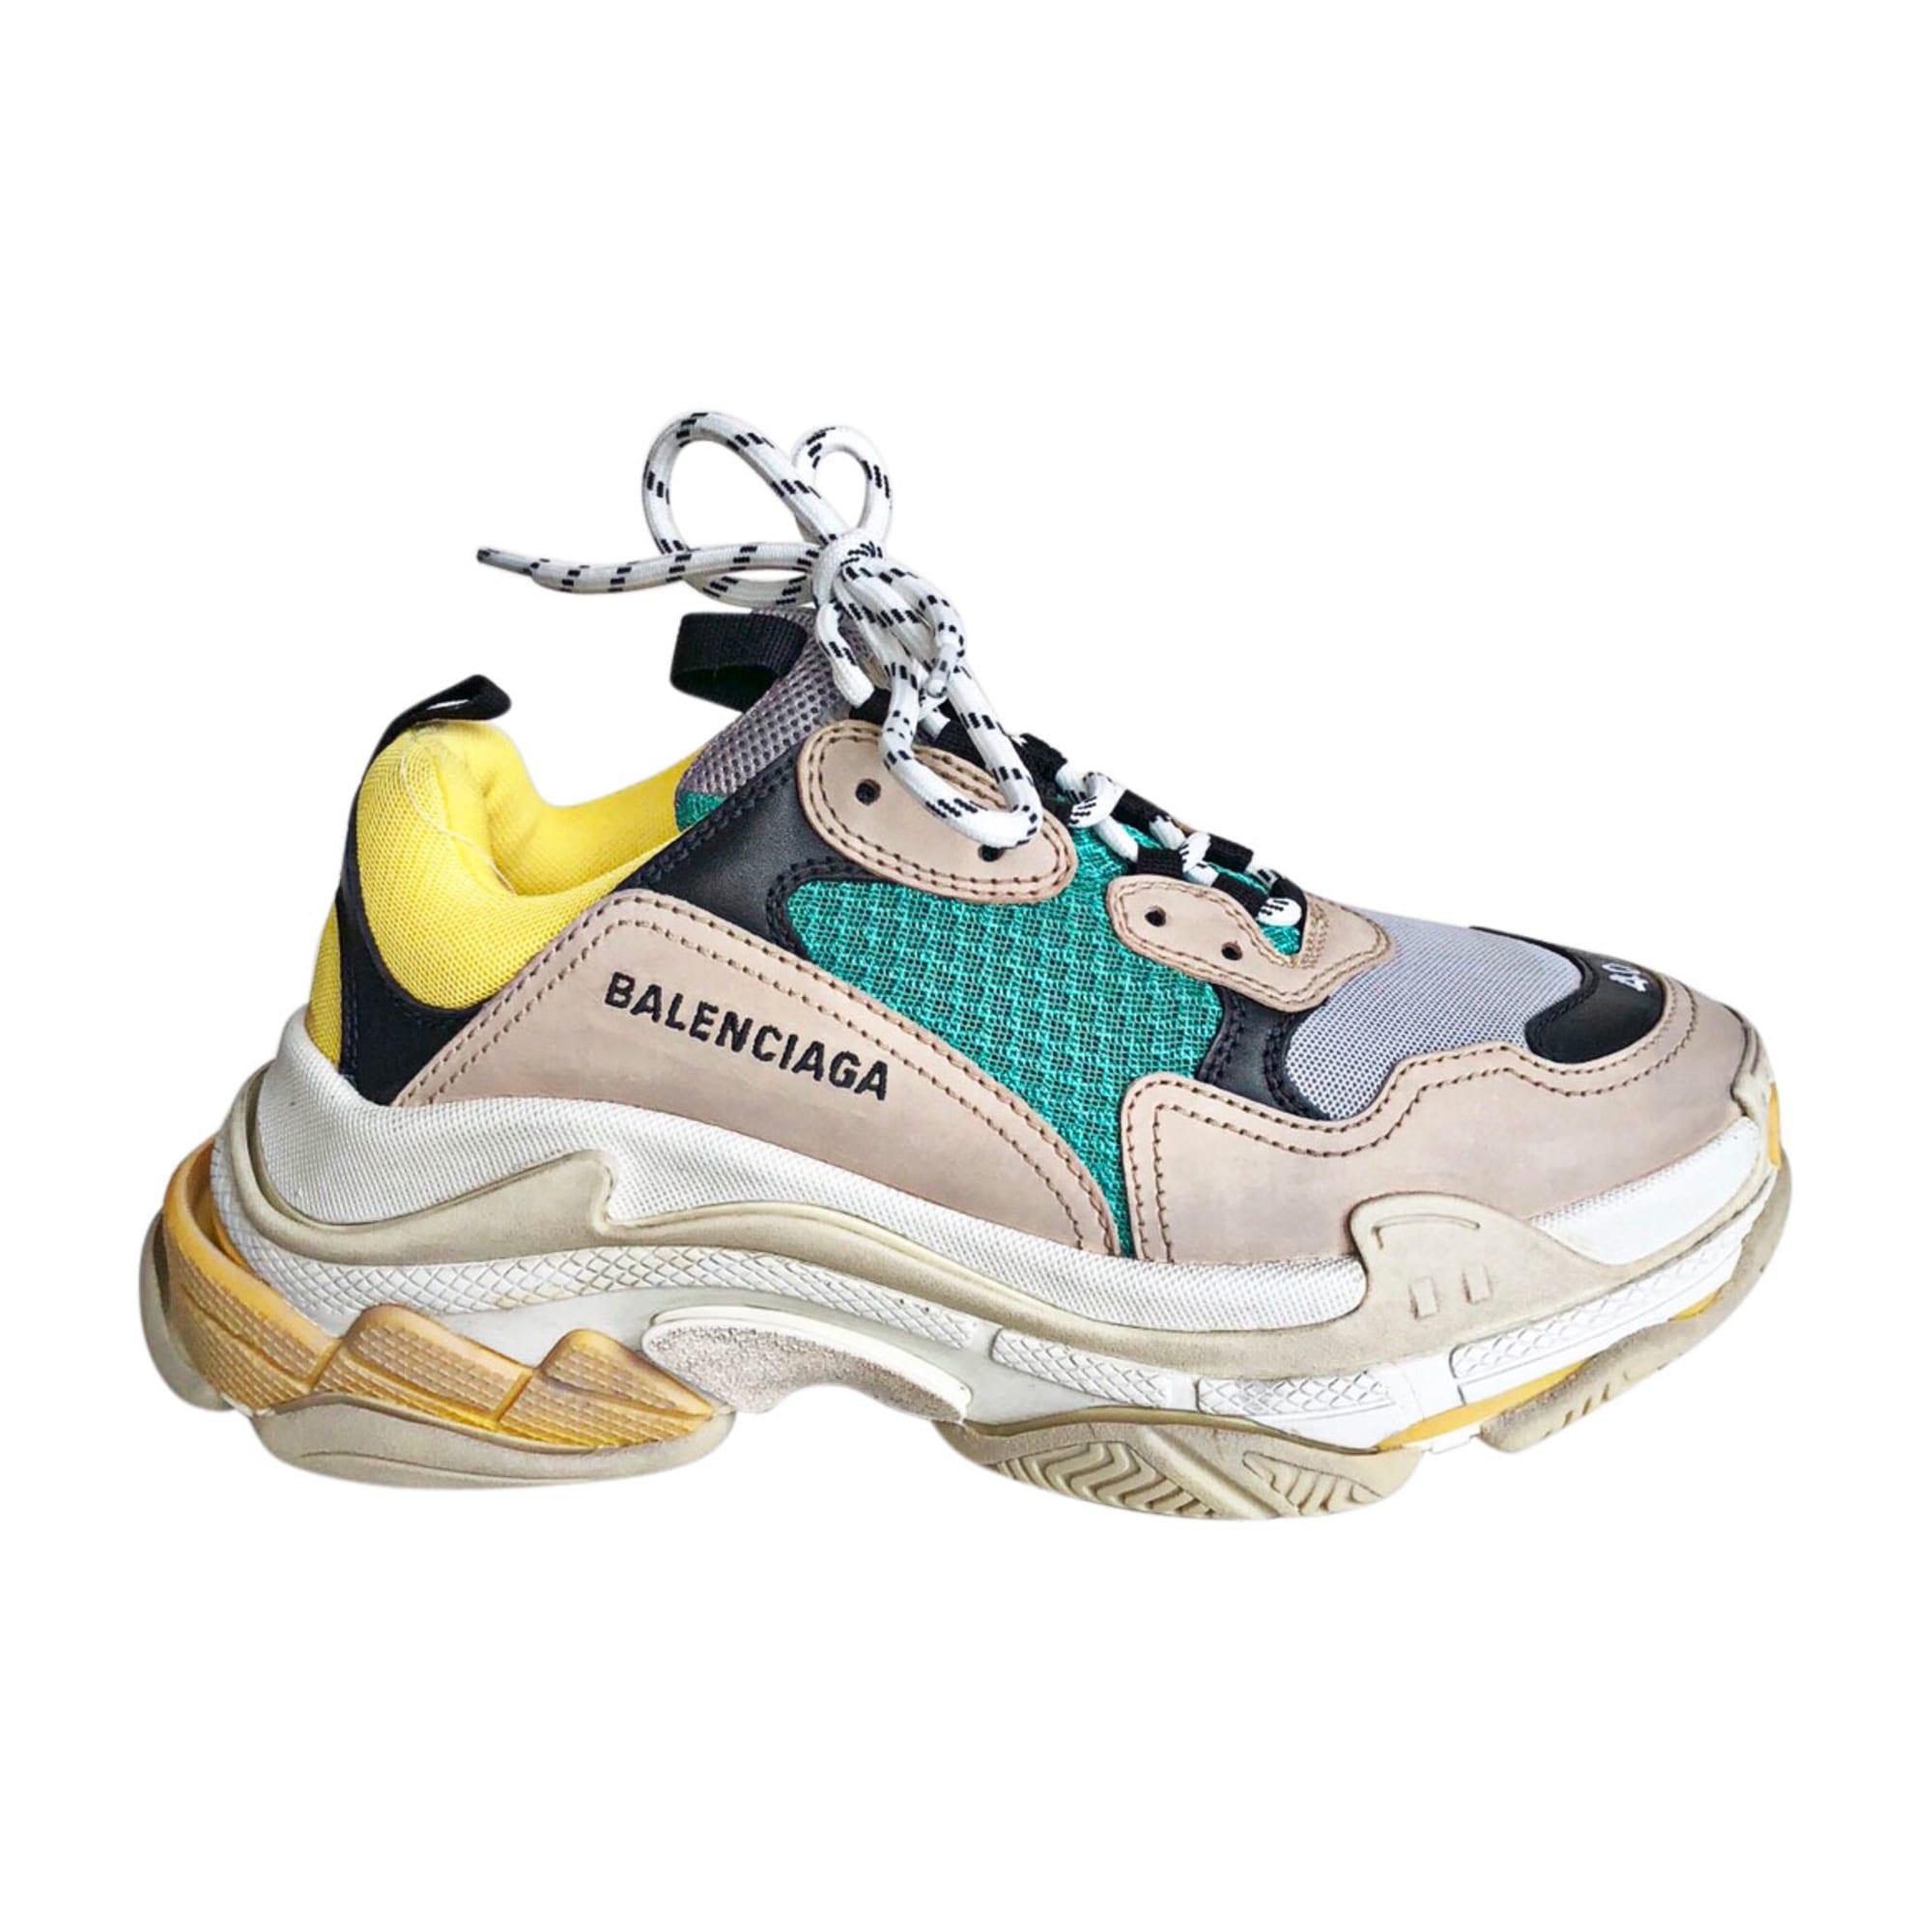 Sport Balenciaga Chaussures Rqpwergnh 40 De 8125862 Blanc X0nqxqvwd